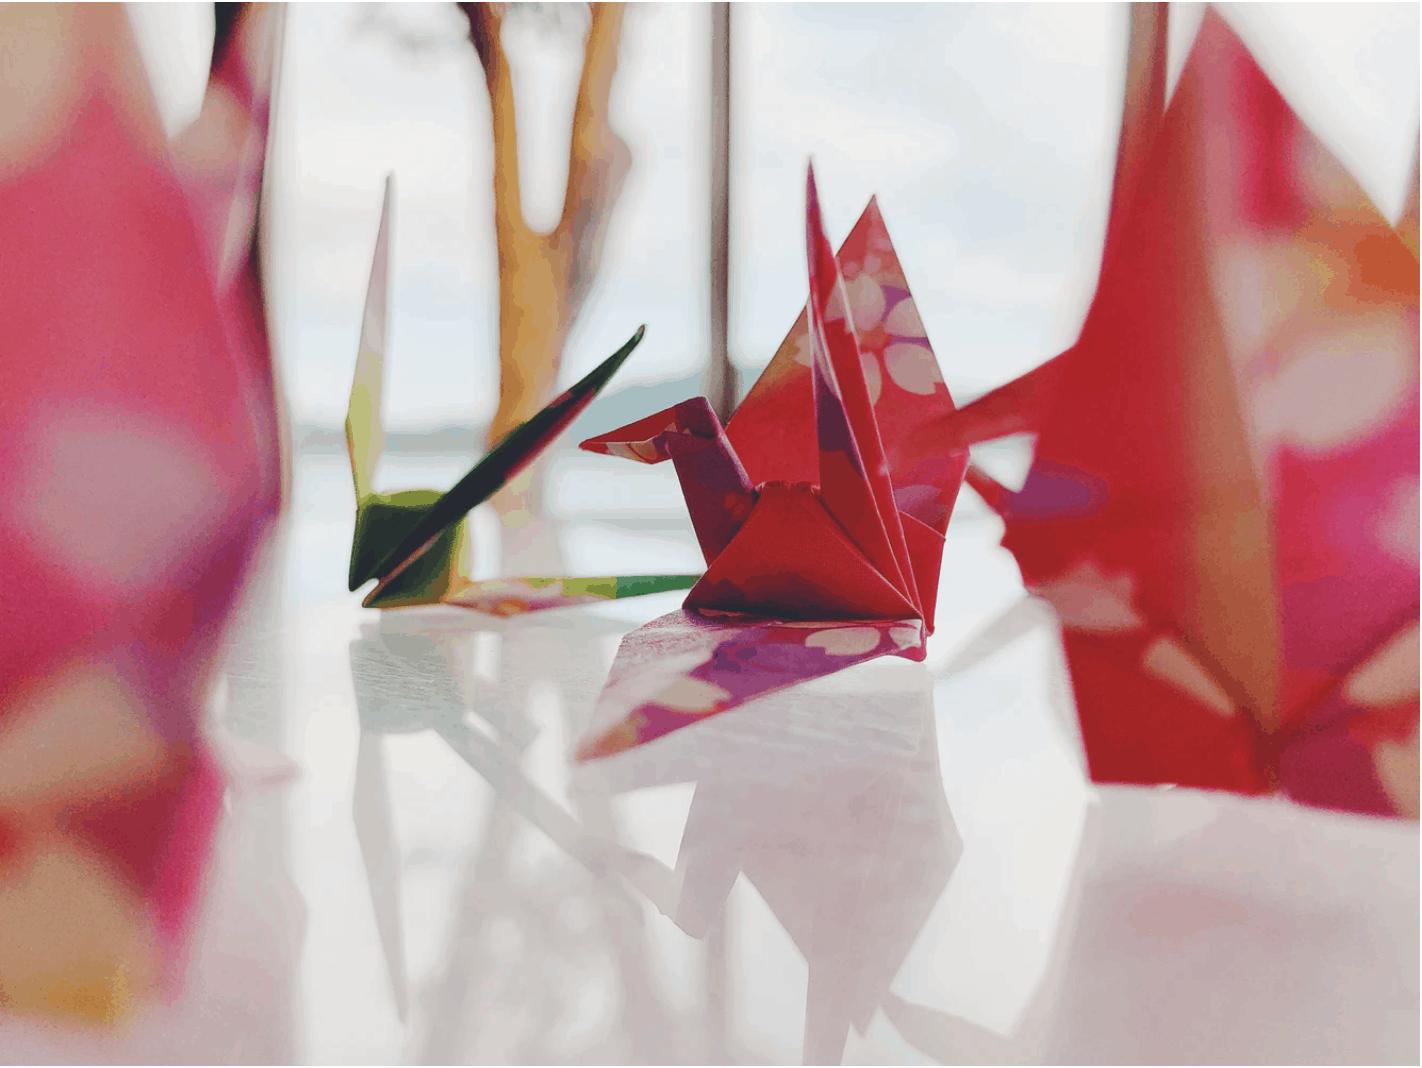 Paper Cranes Bringing Hope to the World | Nippon.com | 1068x1422